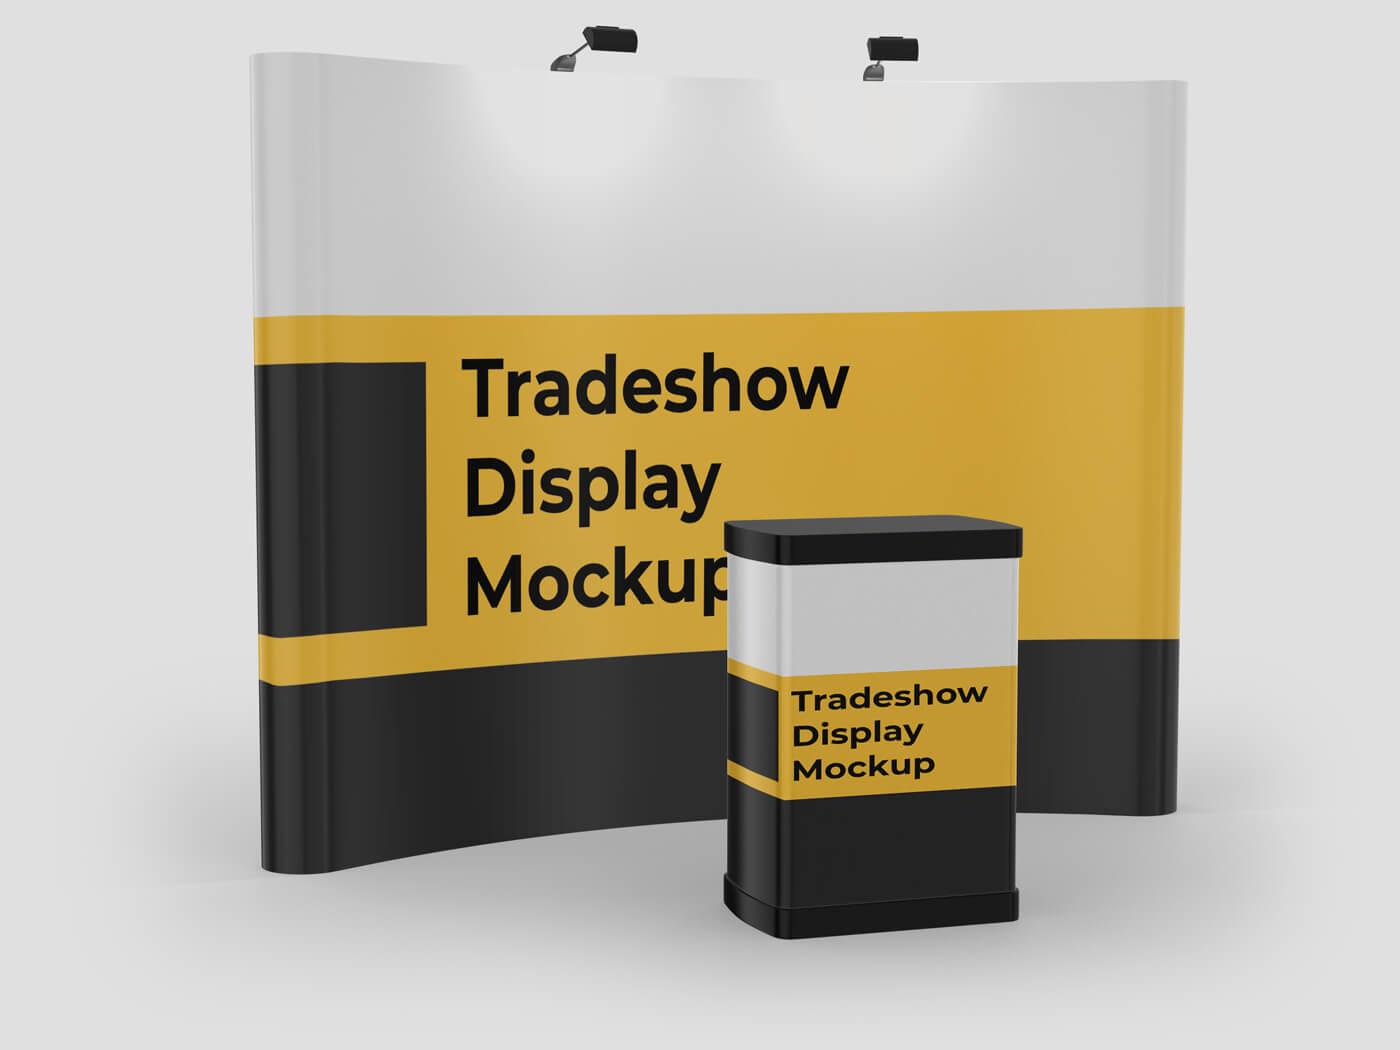 Tradeshow Display Mockup 1